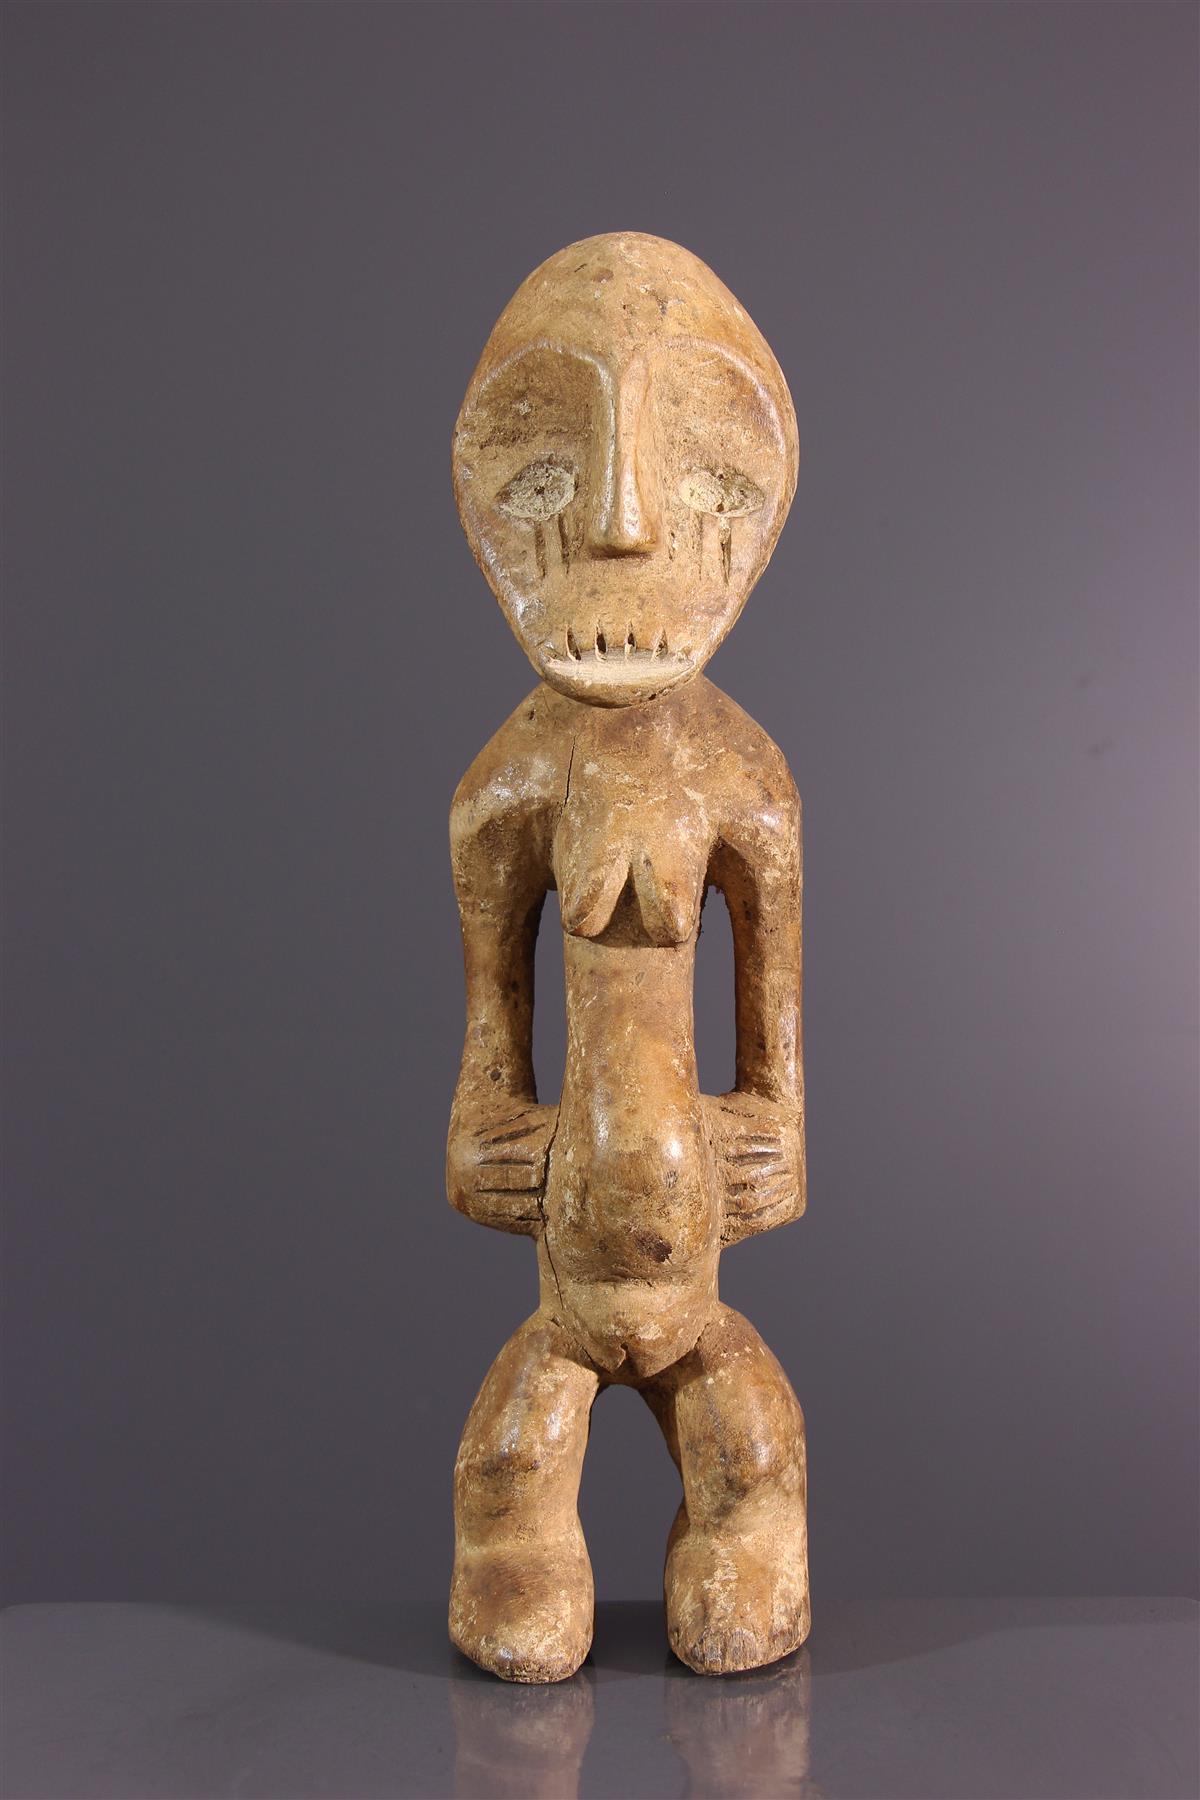 Lega beeldje - Afrikaanse kunst